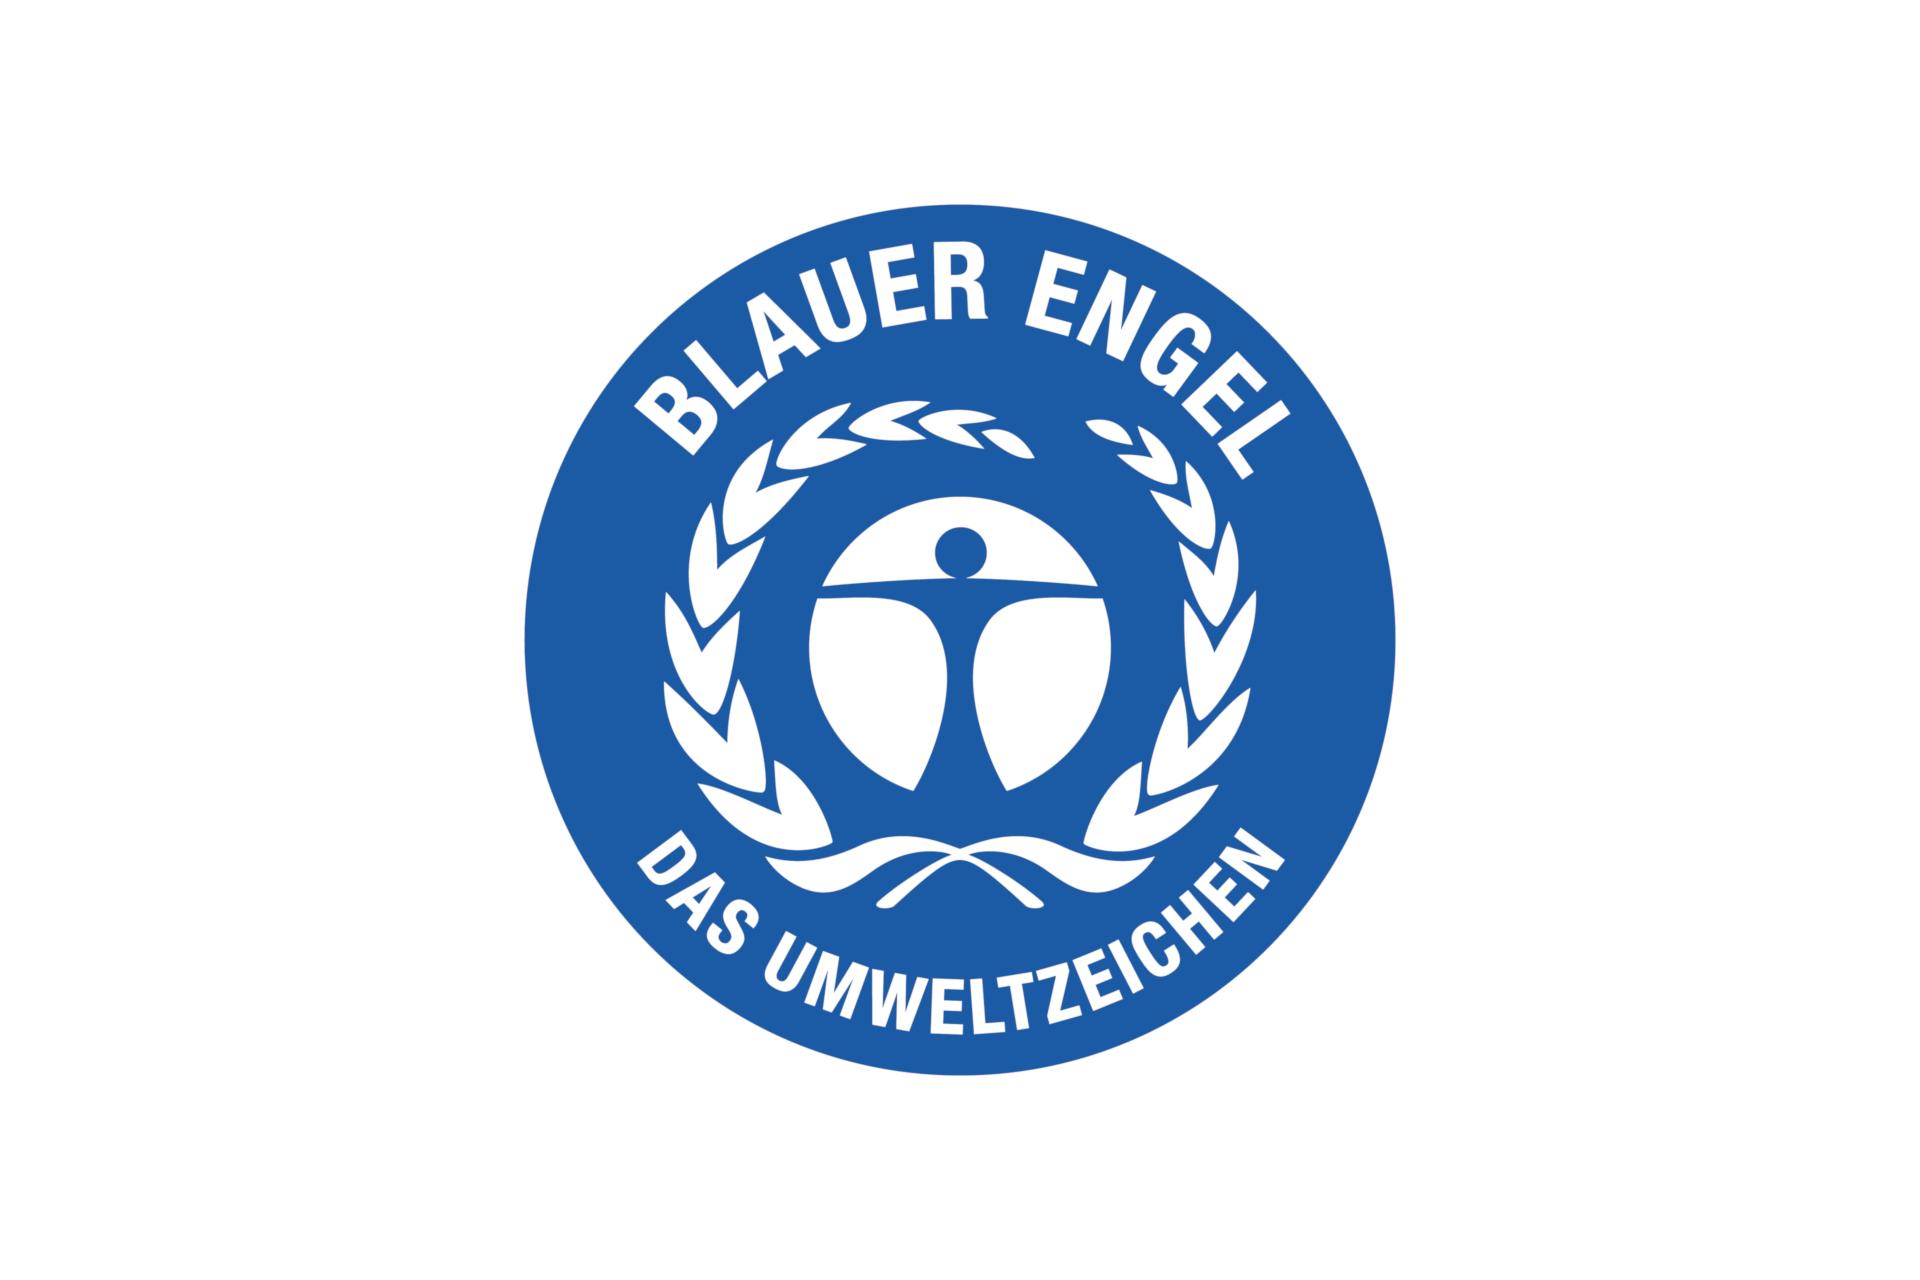 brühl Schlafsofas Eckgruppen Relax Liegen Blauer Engel Umweltfreundlich Ressourcenschonend